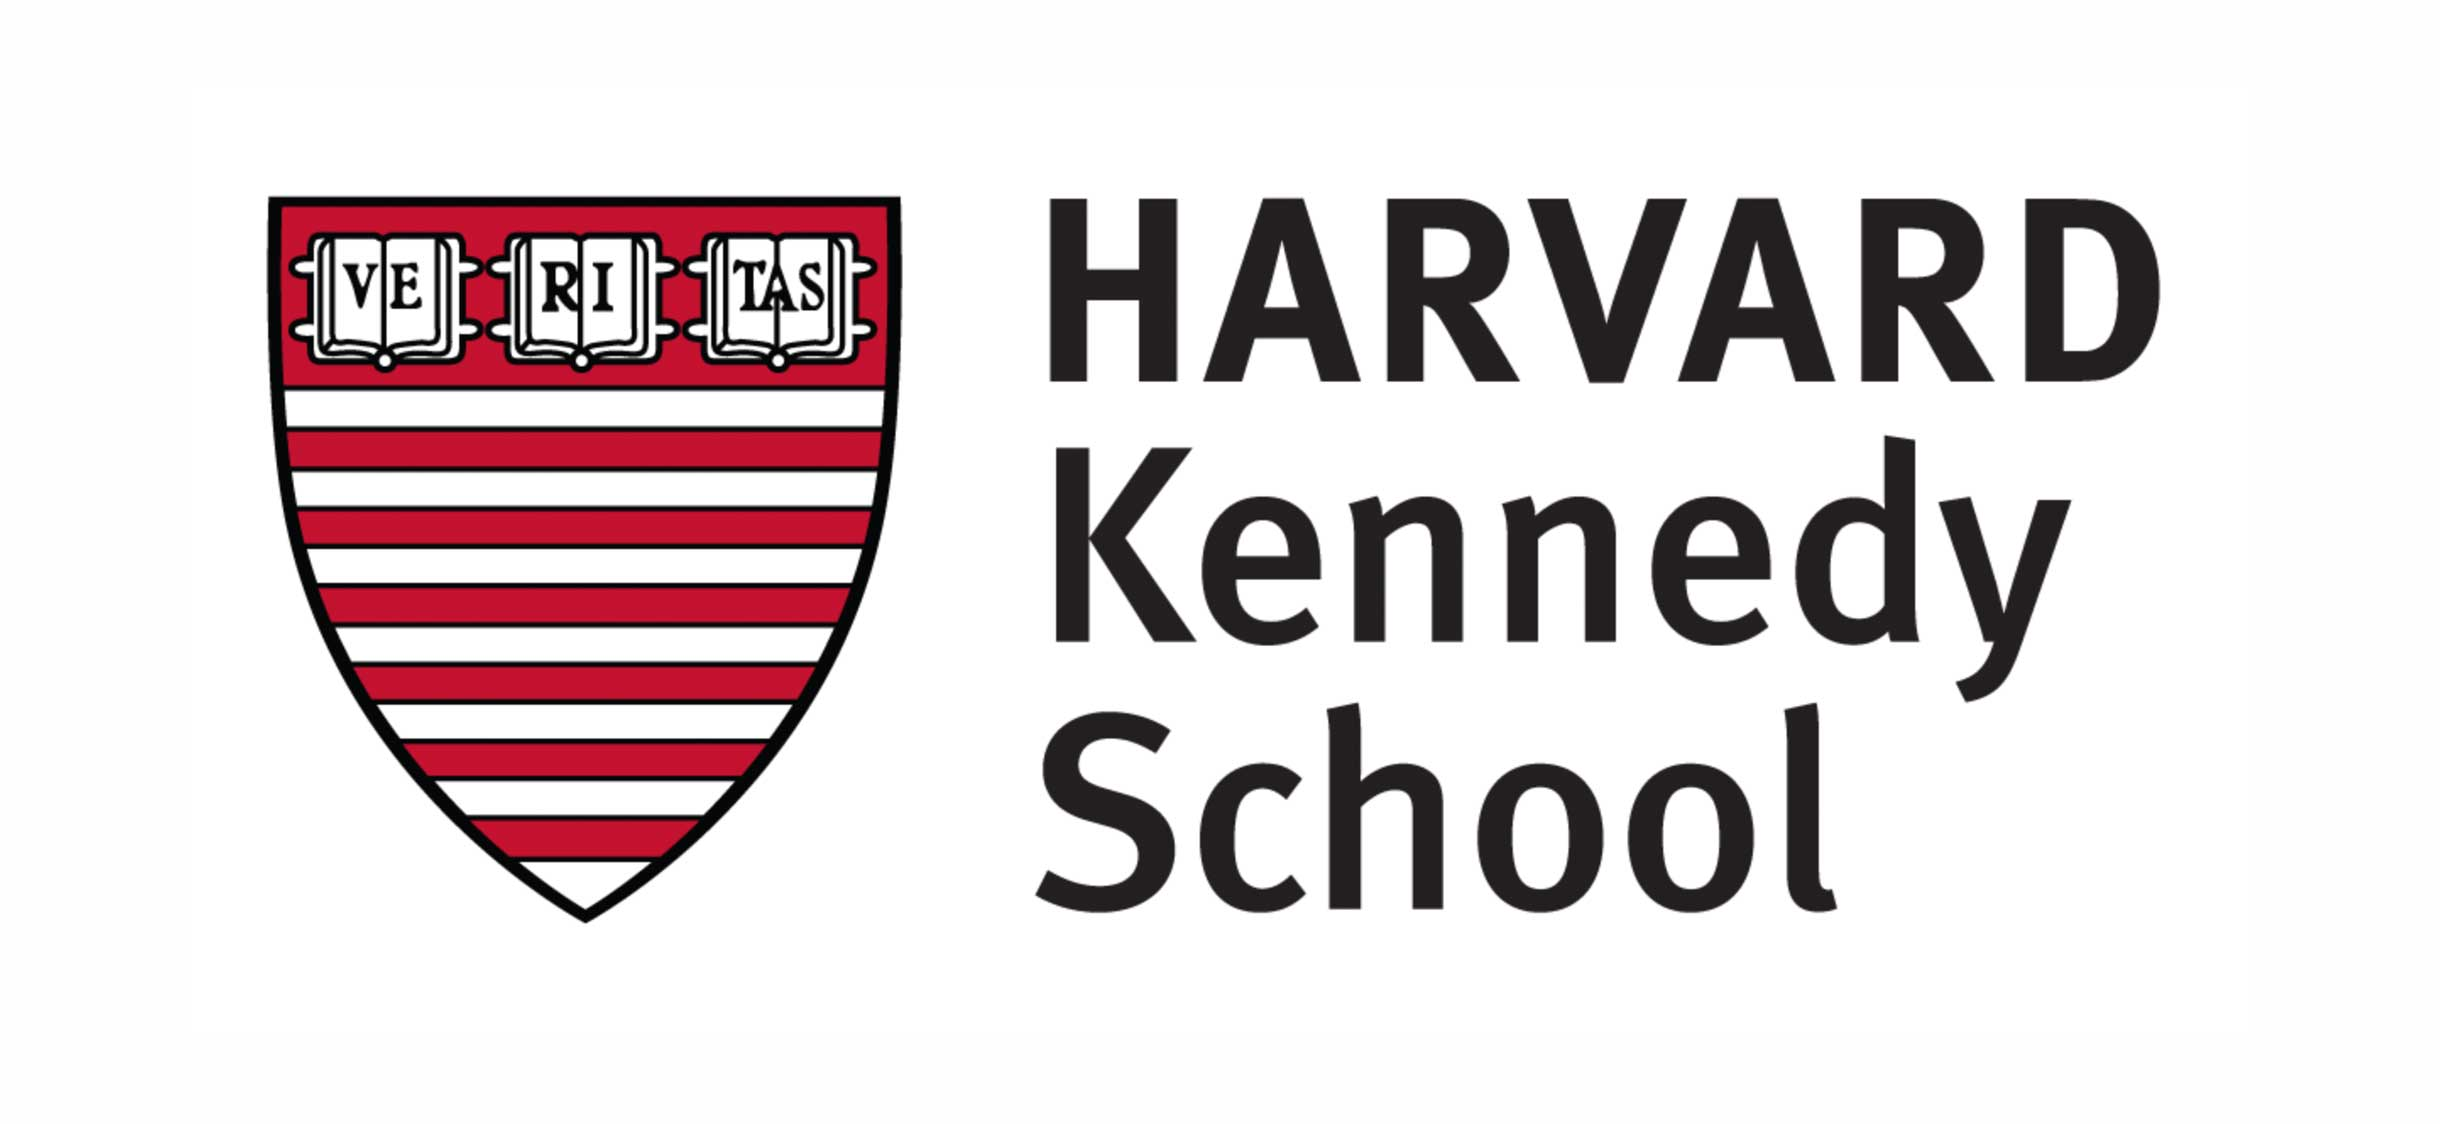 Contact Us | Harvard Kennedy School